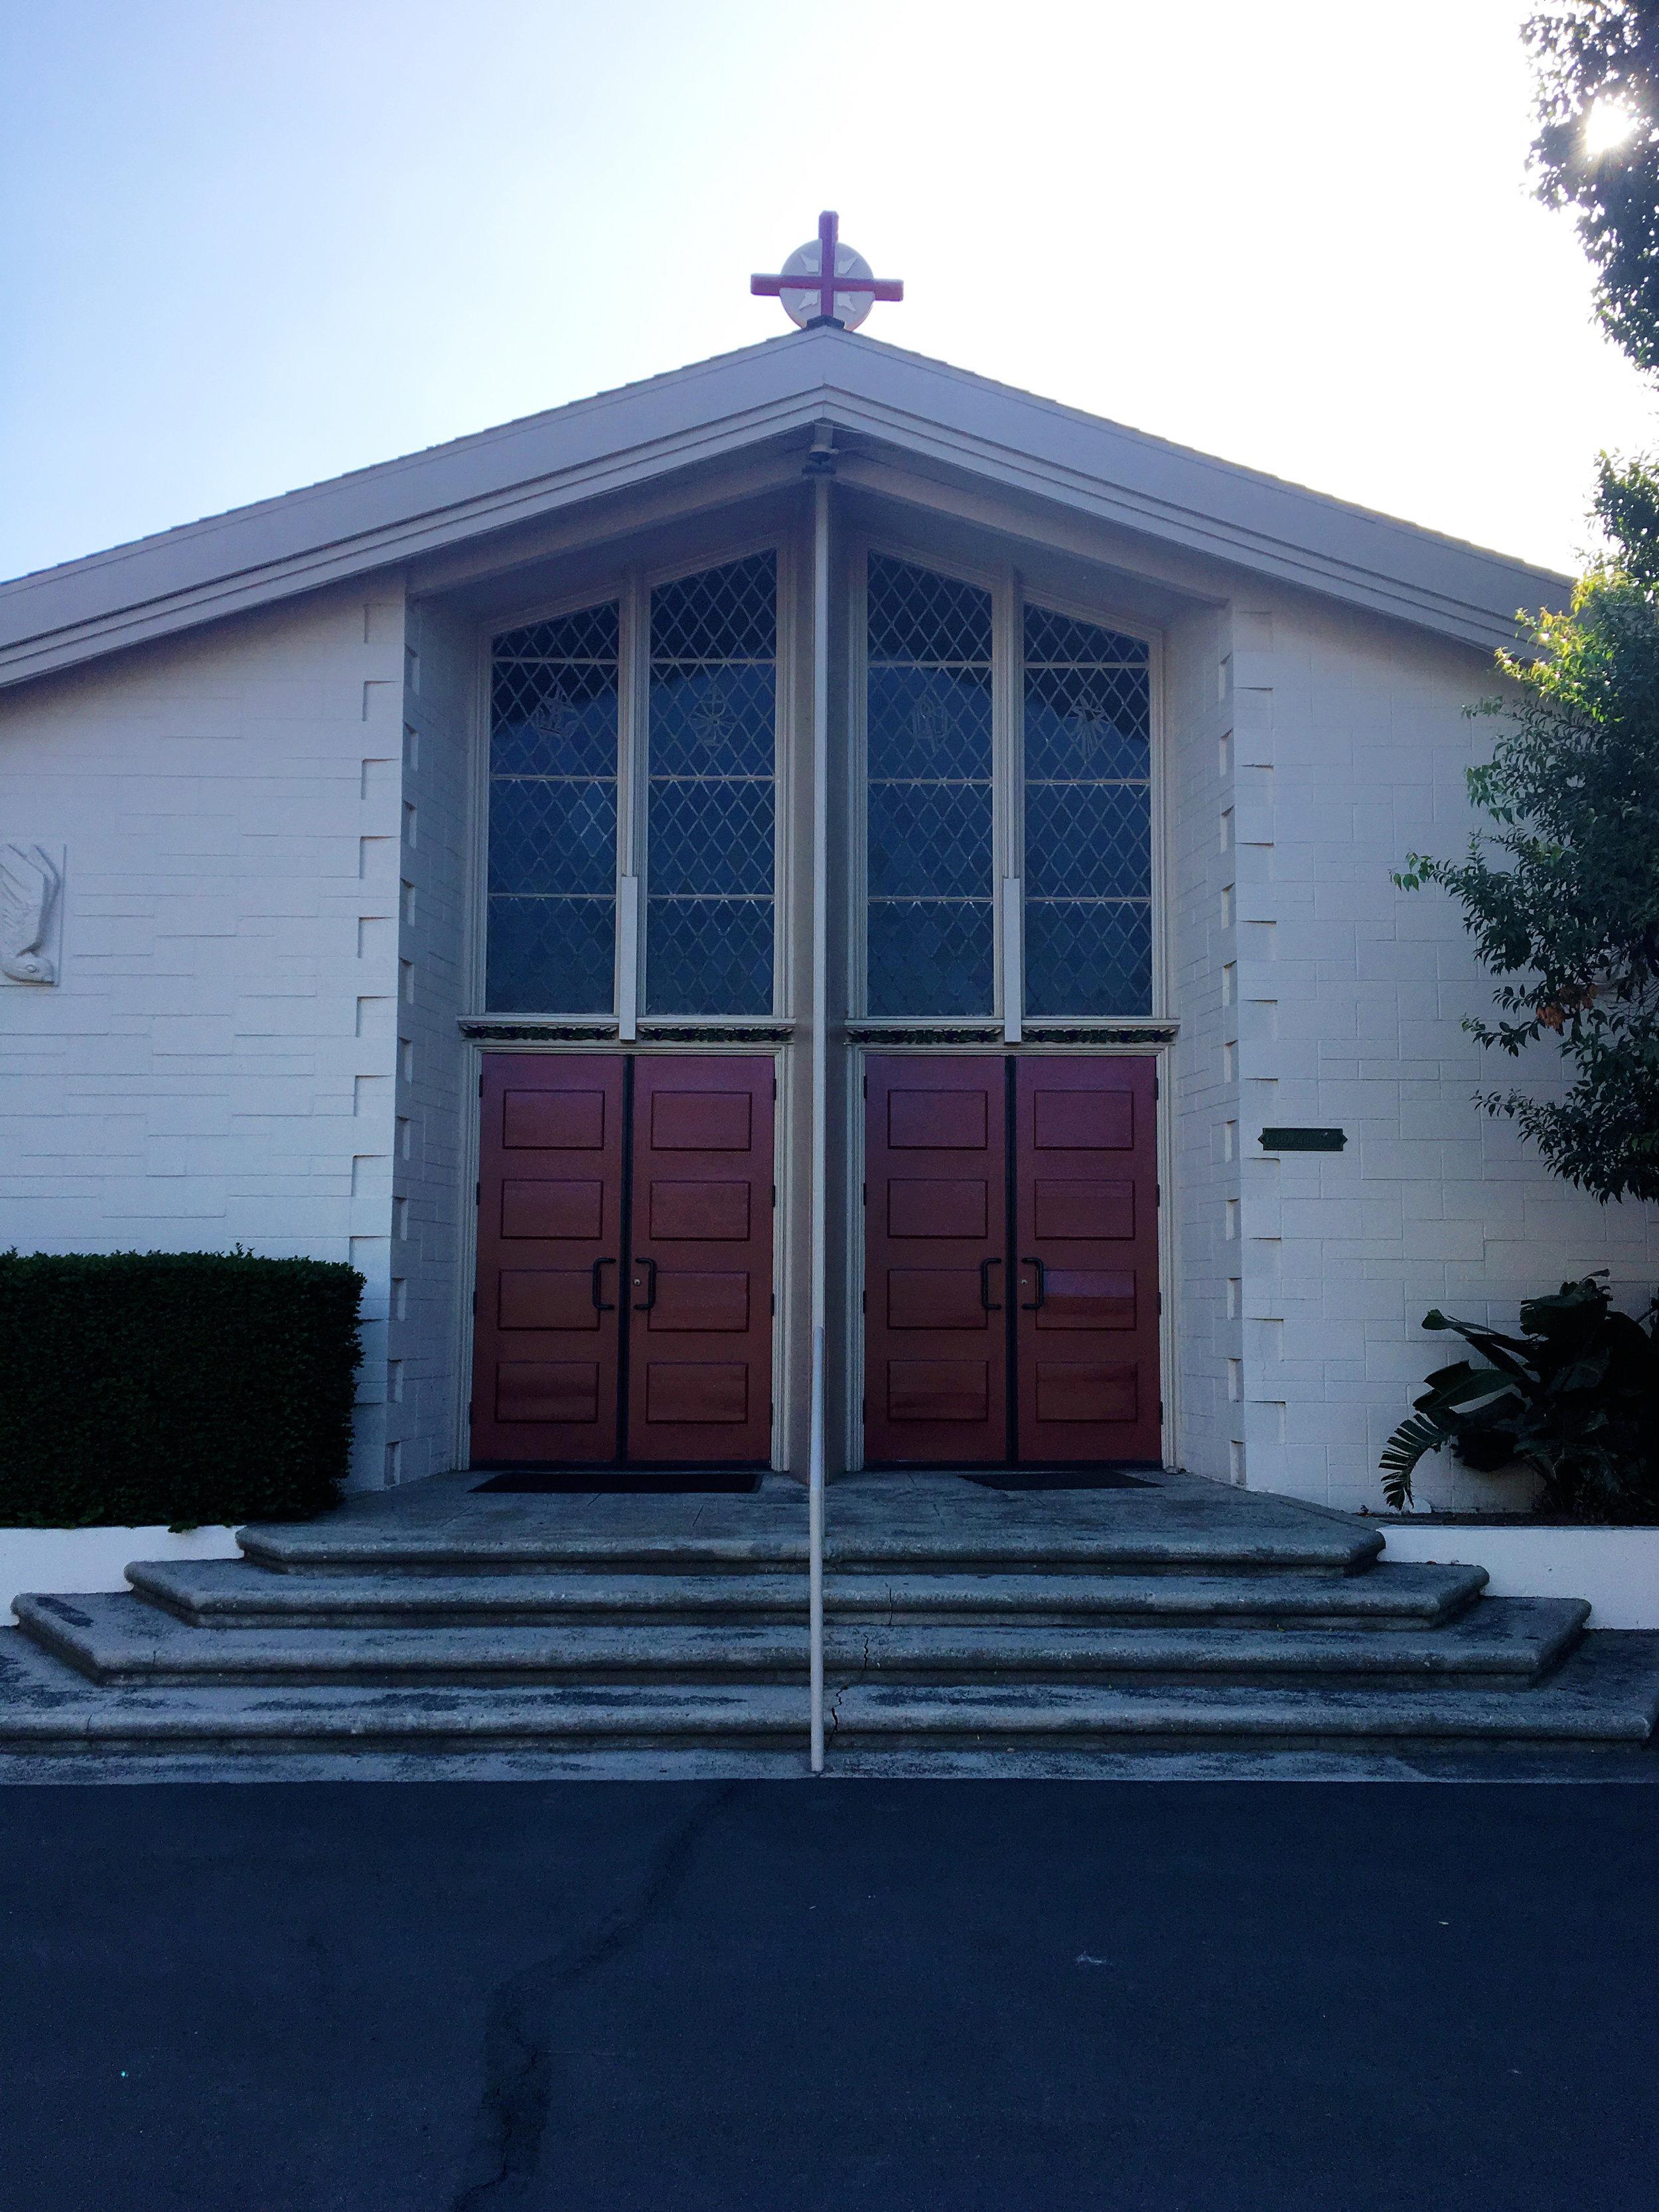 claremont-presbyterian-church-campus-tour-fellowship-hall-outside.jpg